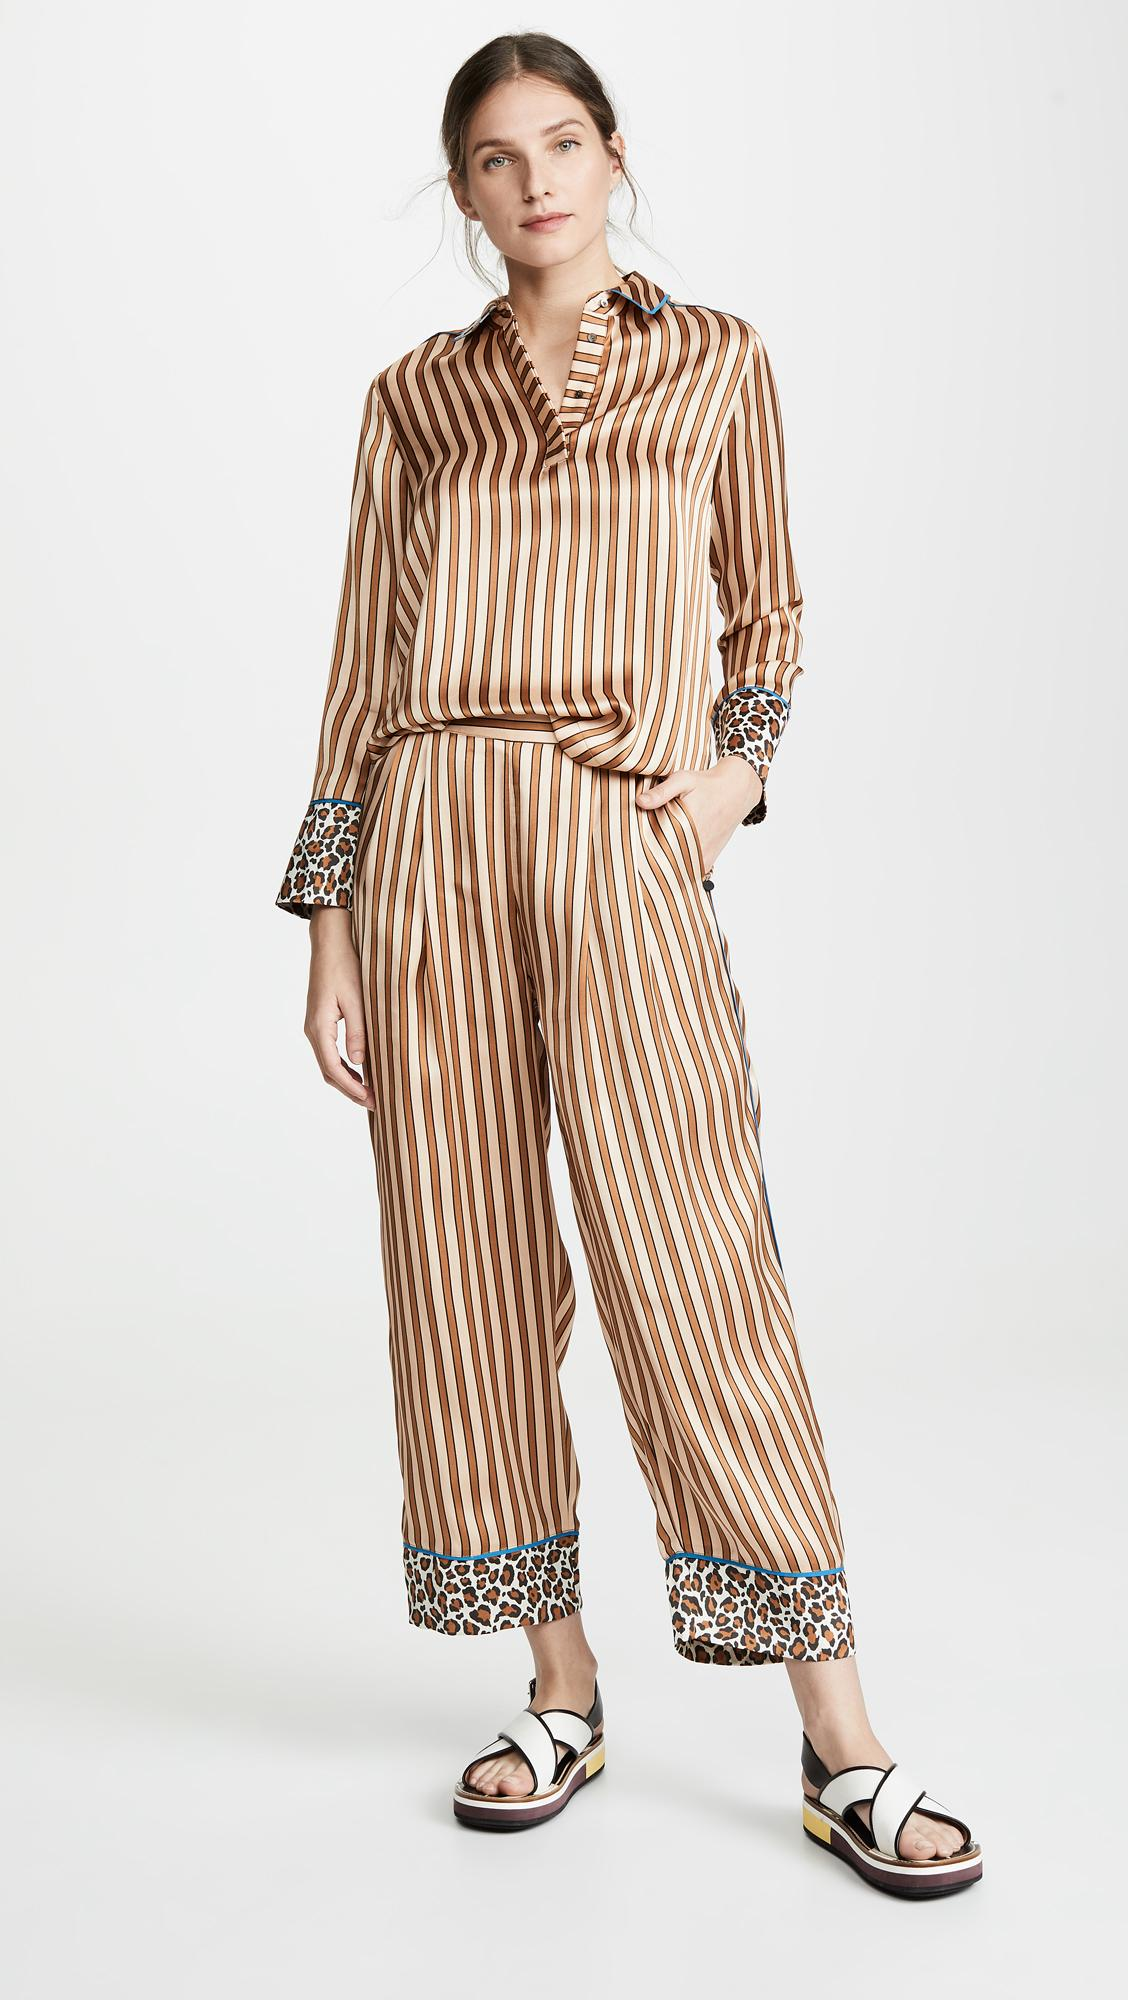 603284b1057d Lyst - Scotch & Soda Pajama Inspired Top